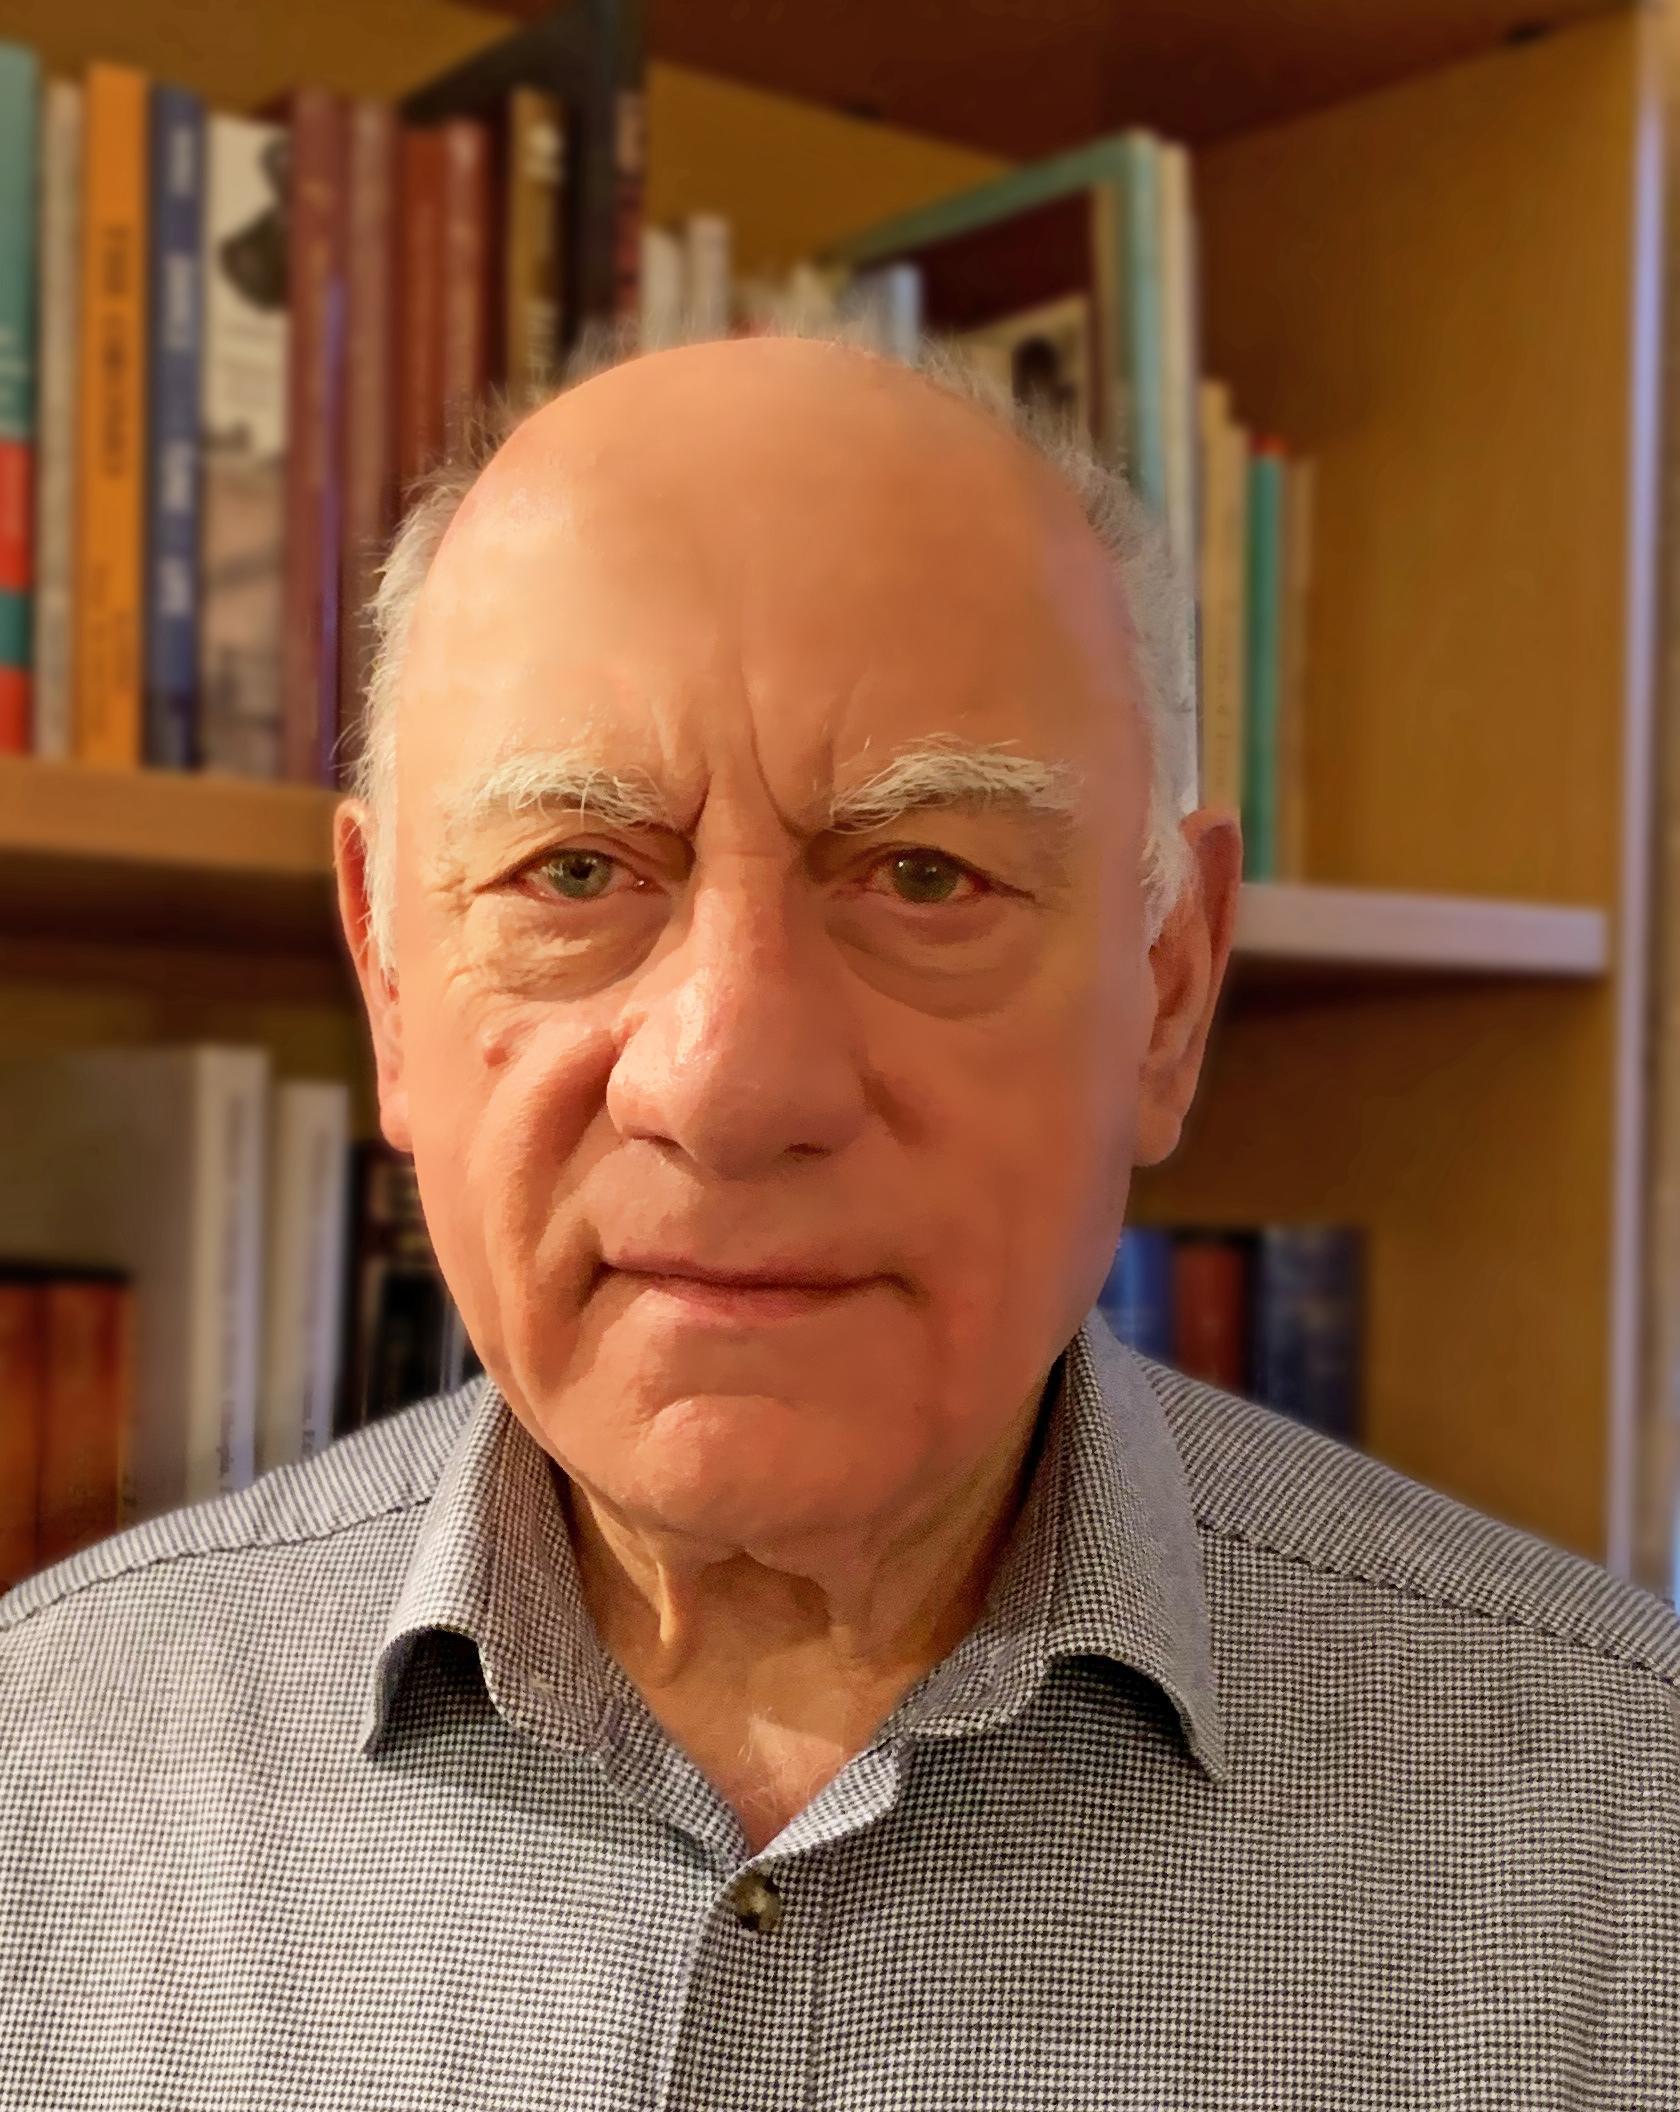 Dr. Neil Brandman